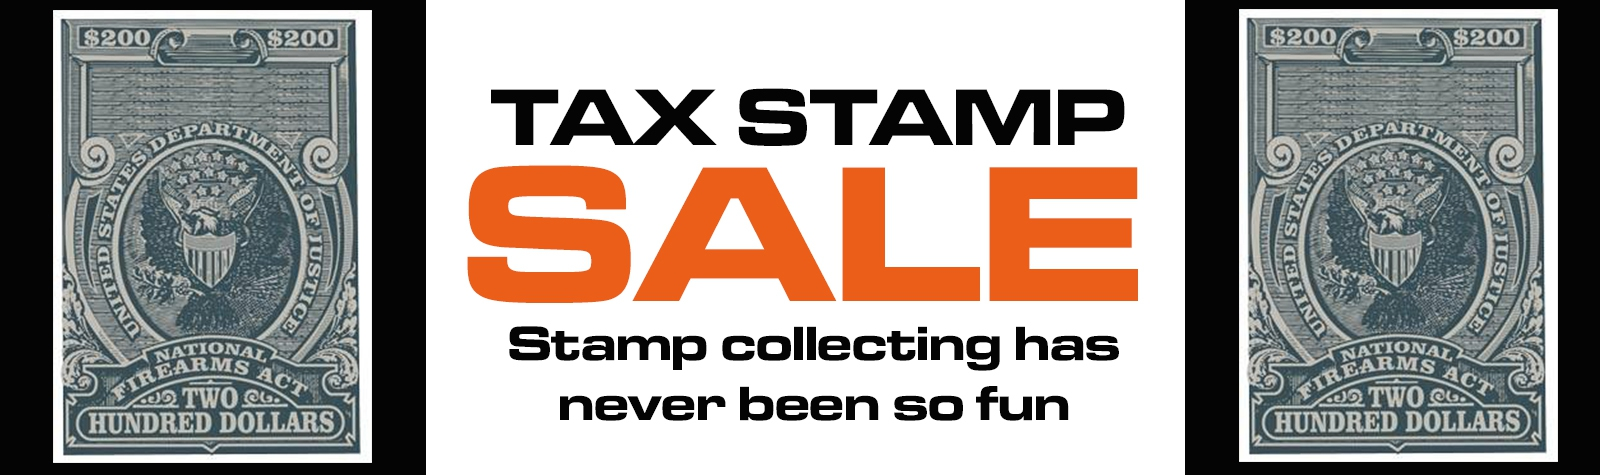 Tax Stamp Sale